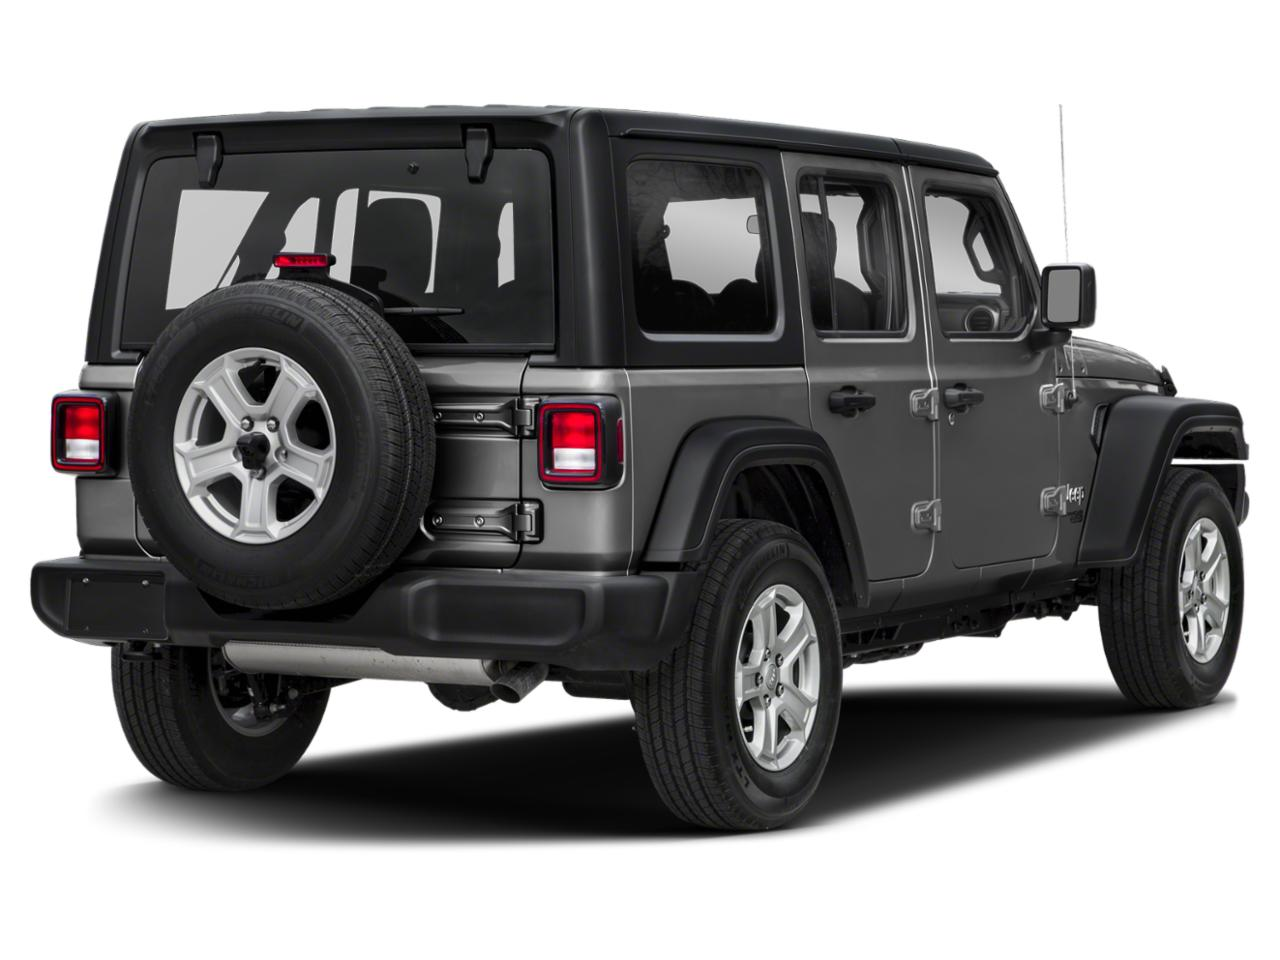 2020 Jeep Wrangler UNLIMITED RUBICON Convertible Slide